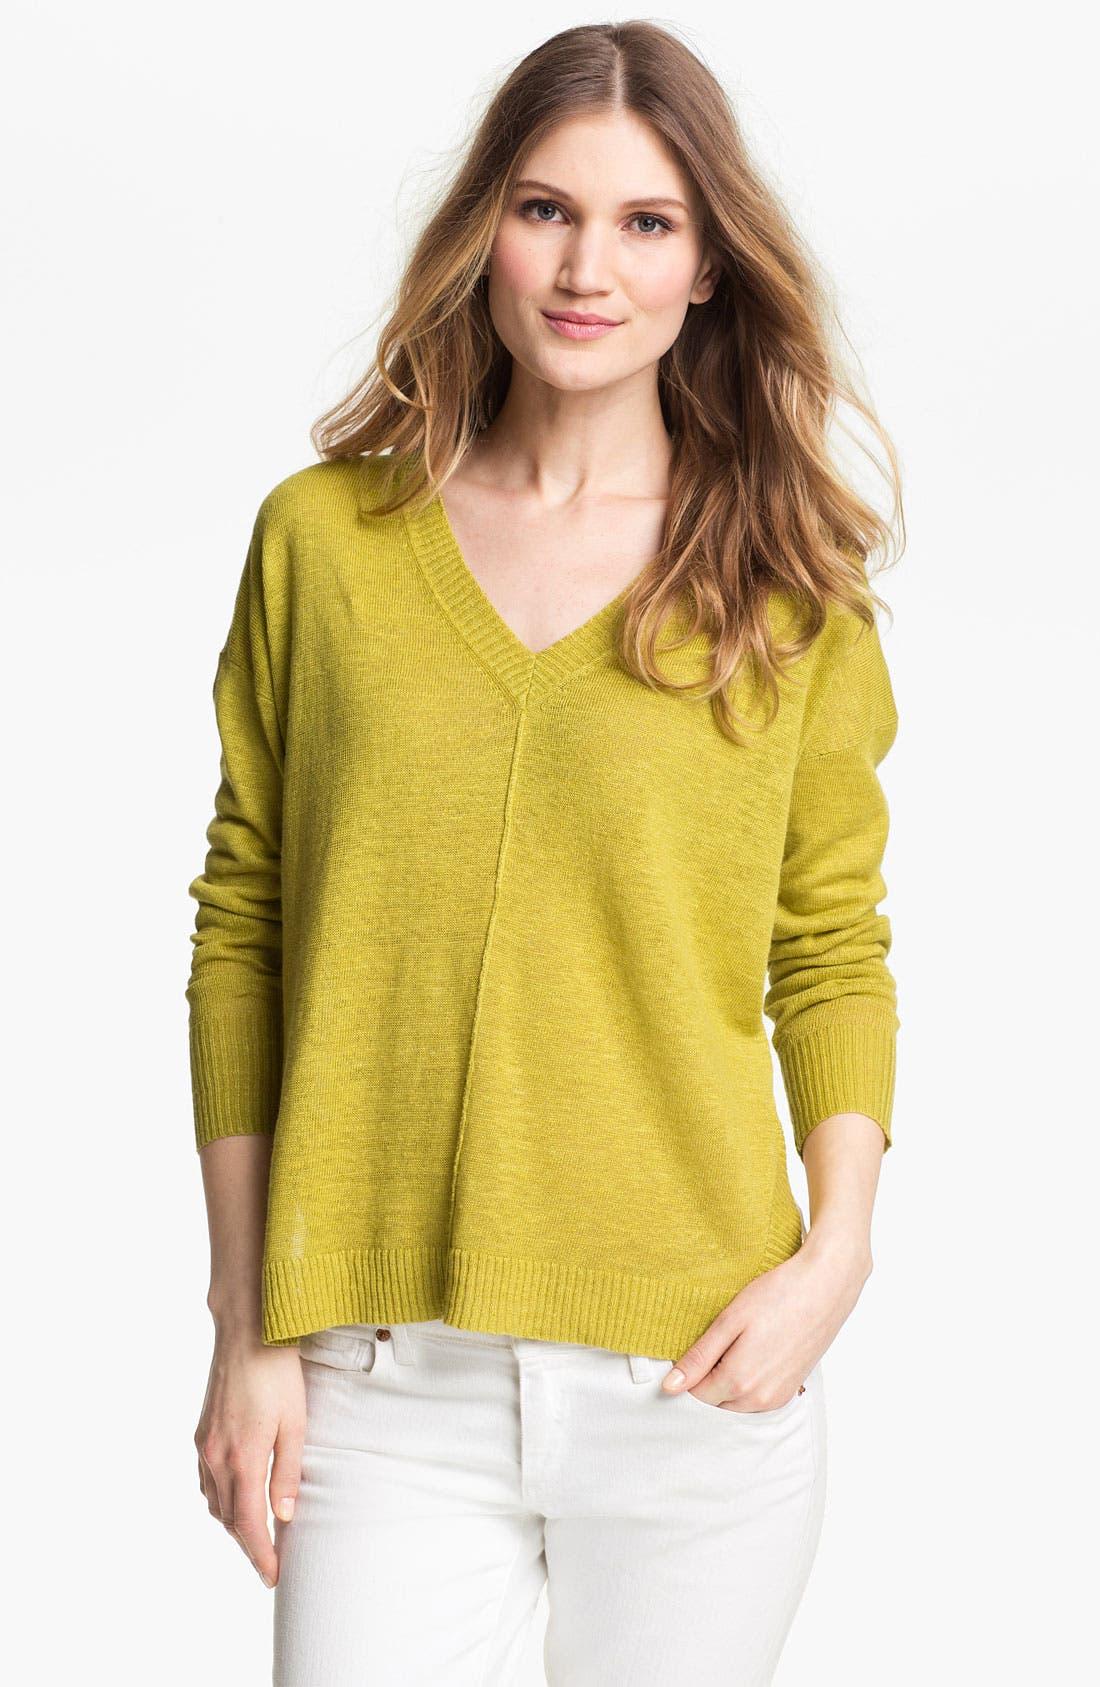 Alternate Image 1 Selected - Eileen Fisher Boxy V-Neck Sweater